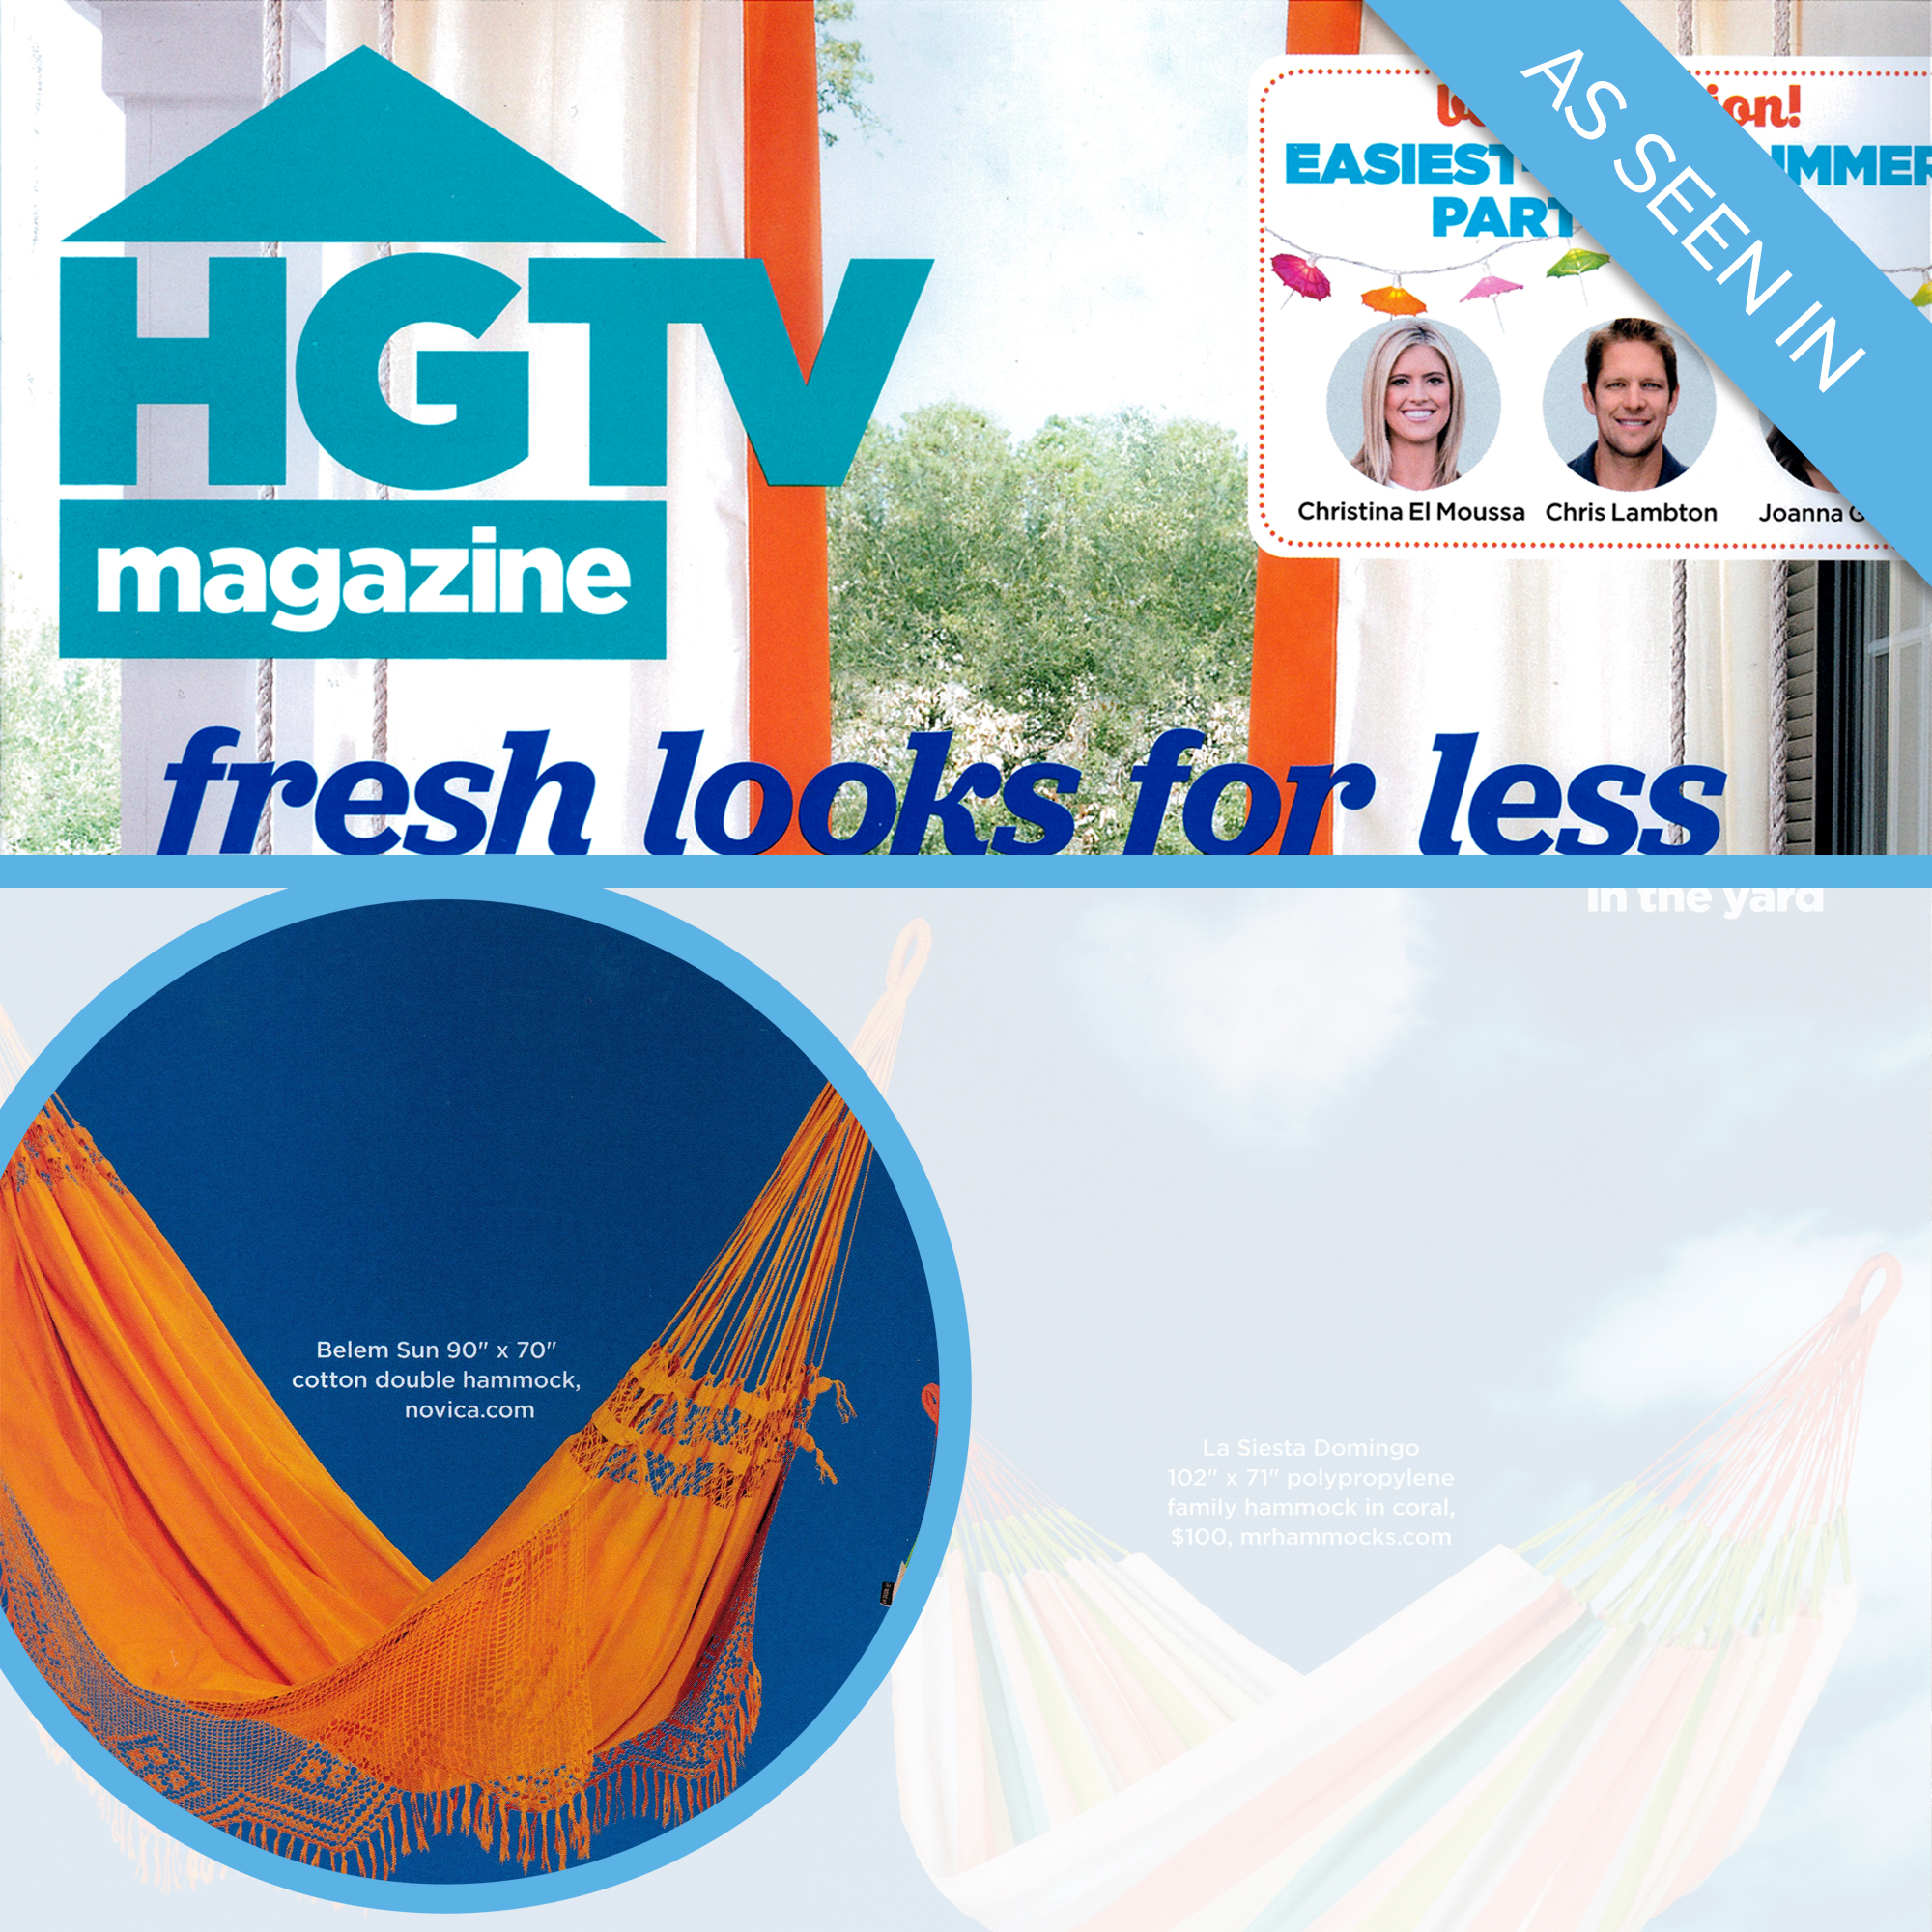 HGTV-PR 1